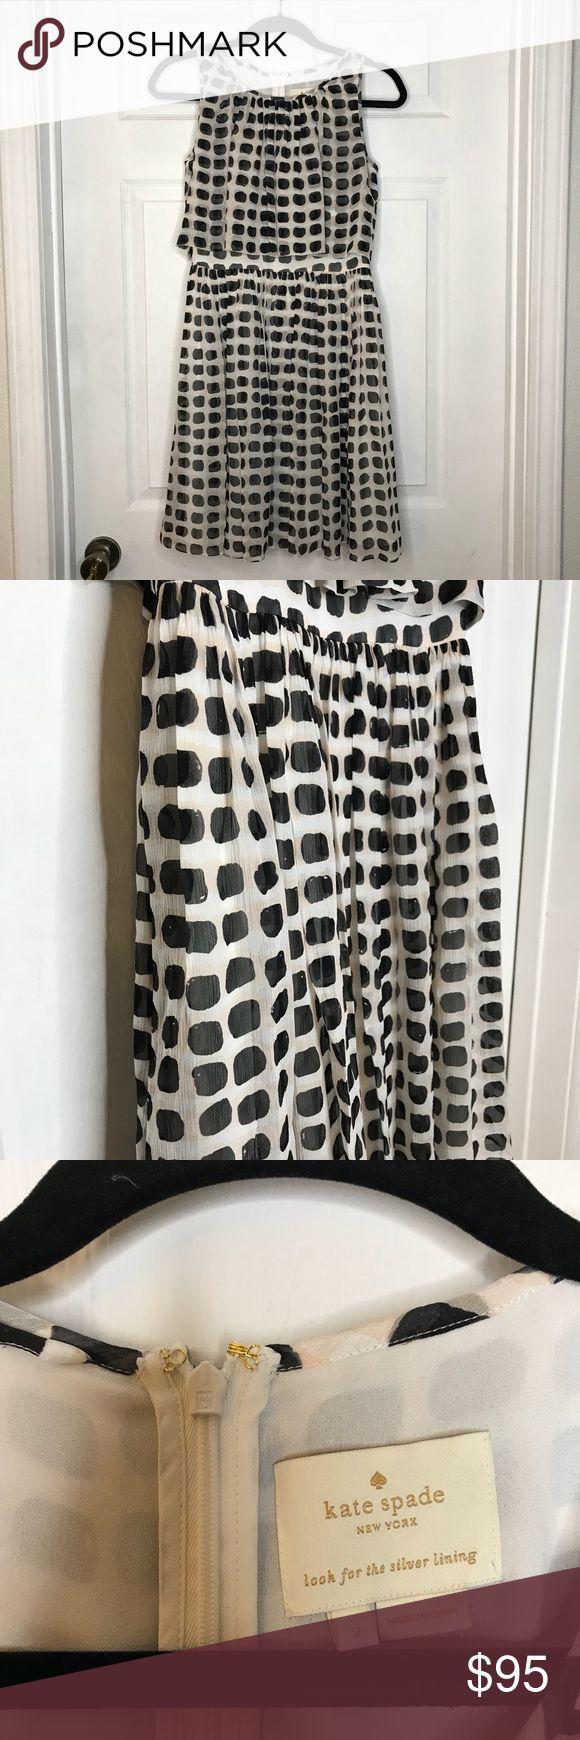 $490 Kate spade Island Stamp Chifon dress 100% authentic Kate Spade Island Stamp Chifon Dress || size 2 || brand new || dress only || original tag still on || msrp $448 + tax kate spade Dresses Mini